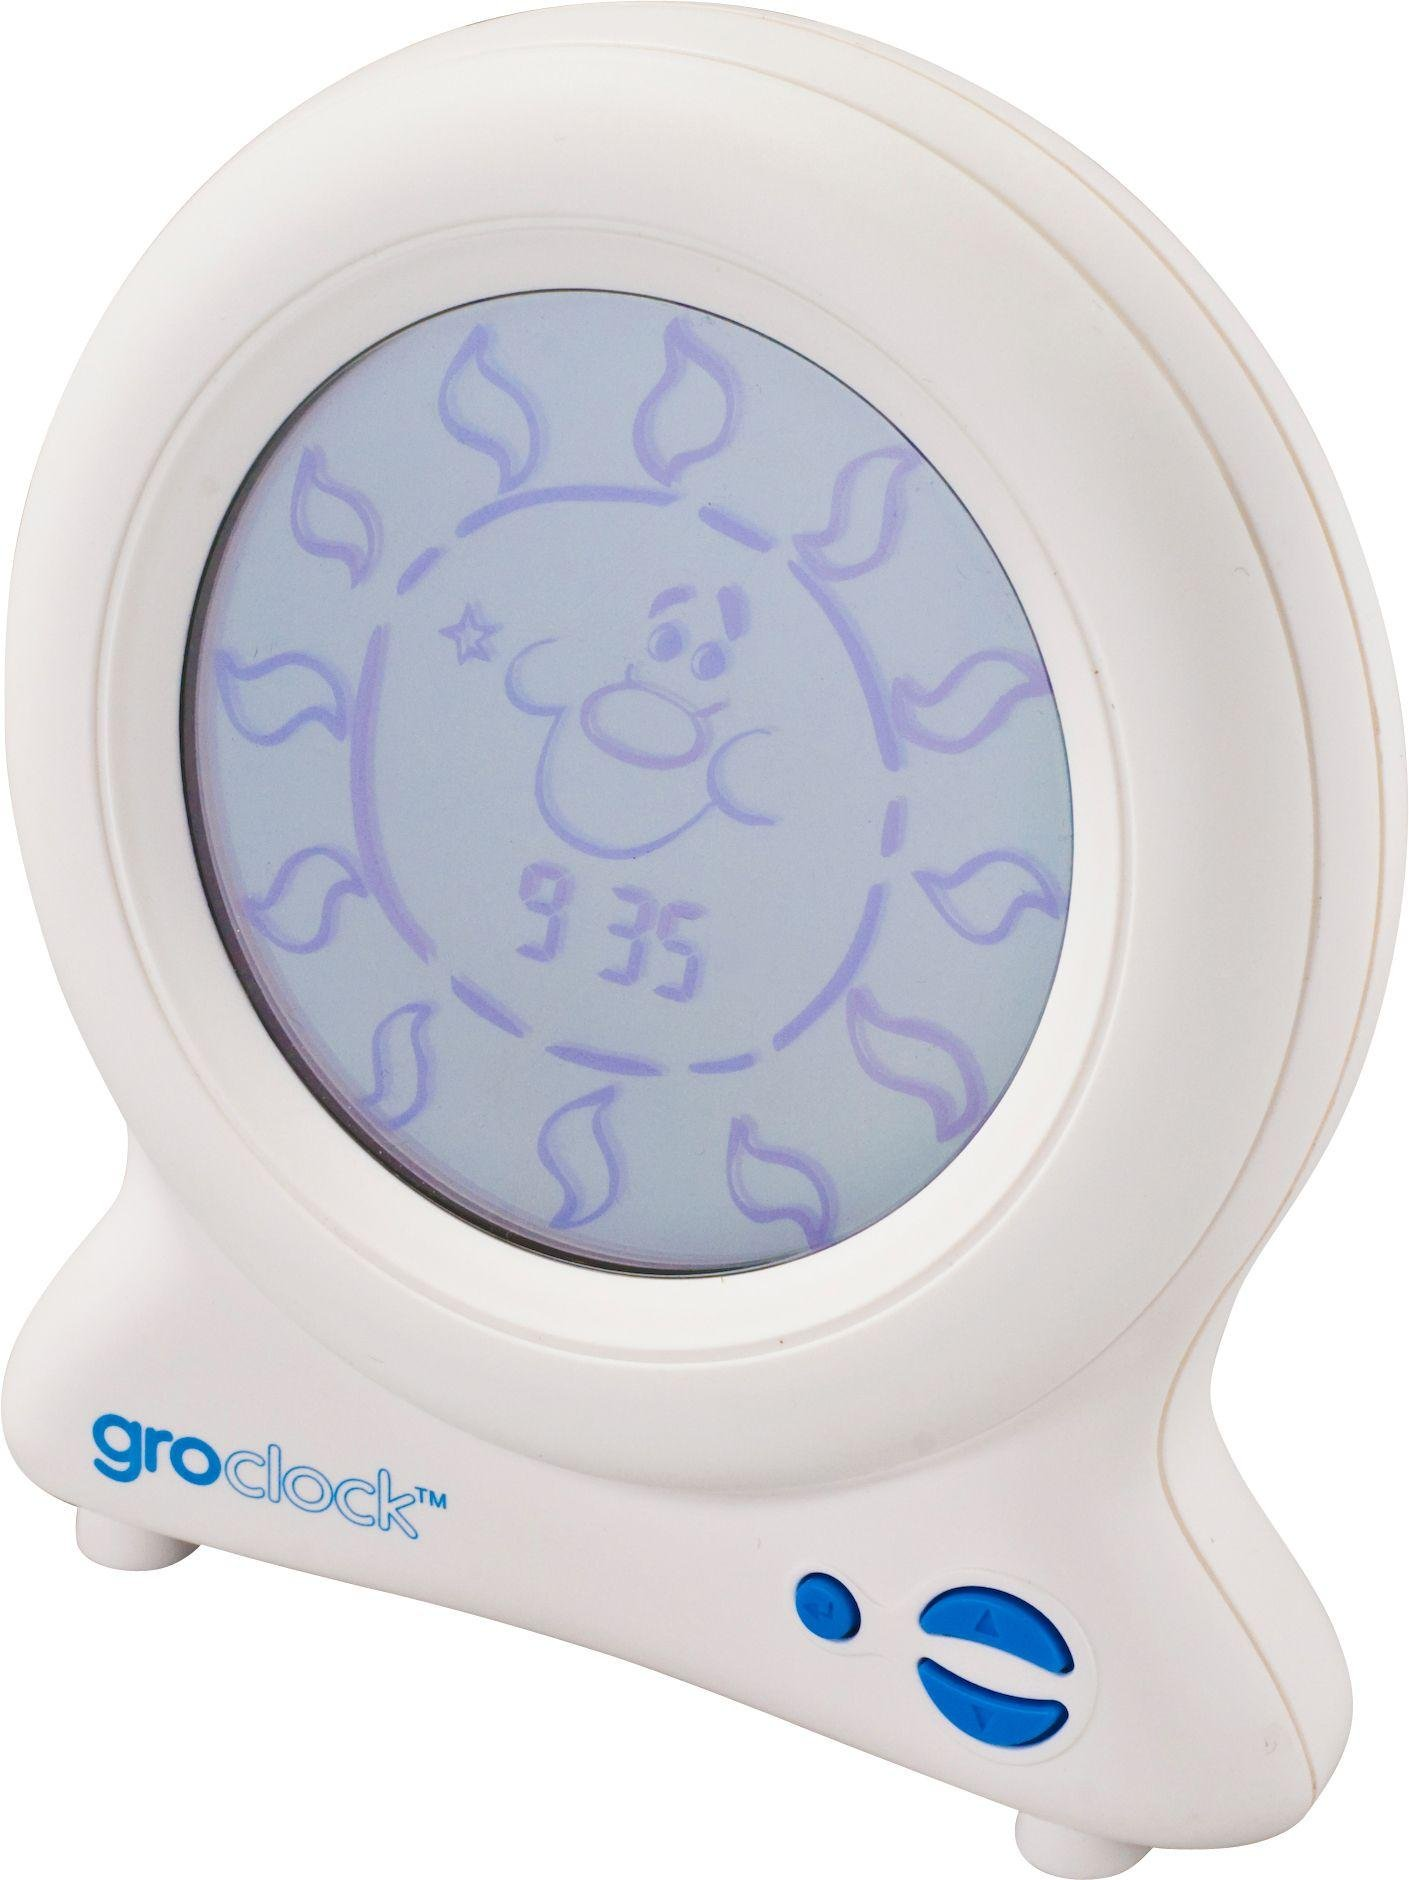 Gro-Clock Children's Alarm Clock review